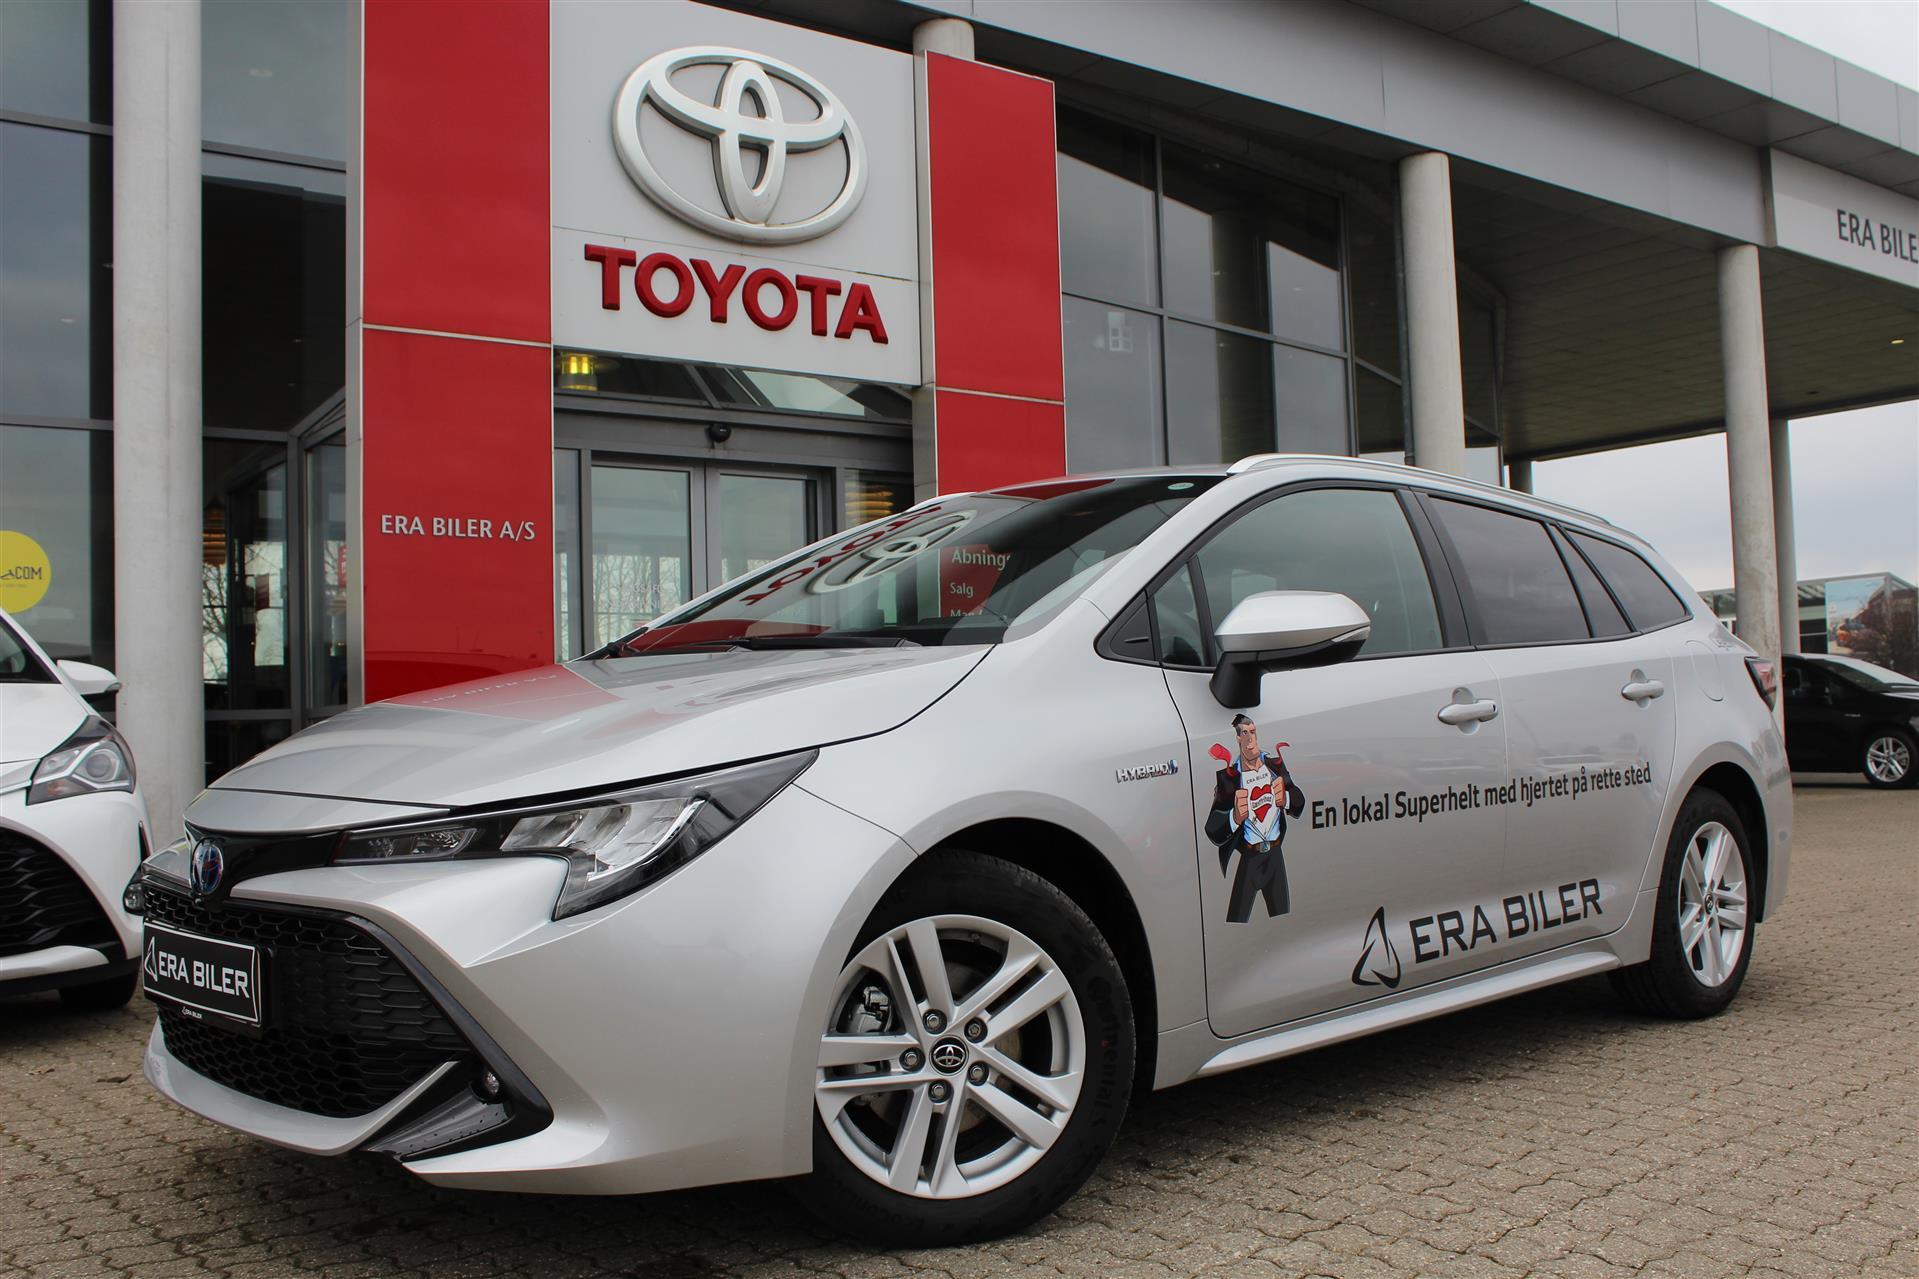 Billede af Toyota Corolla Touring Sports 1,8 B/EL H3 Smartpakke E-CVT 122HK Stc Trinl. Gear